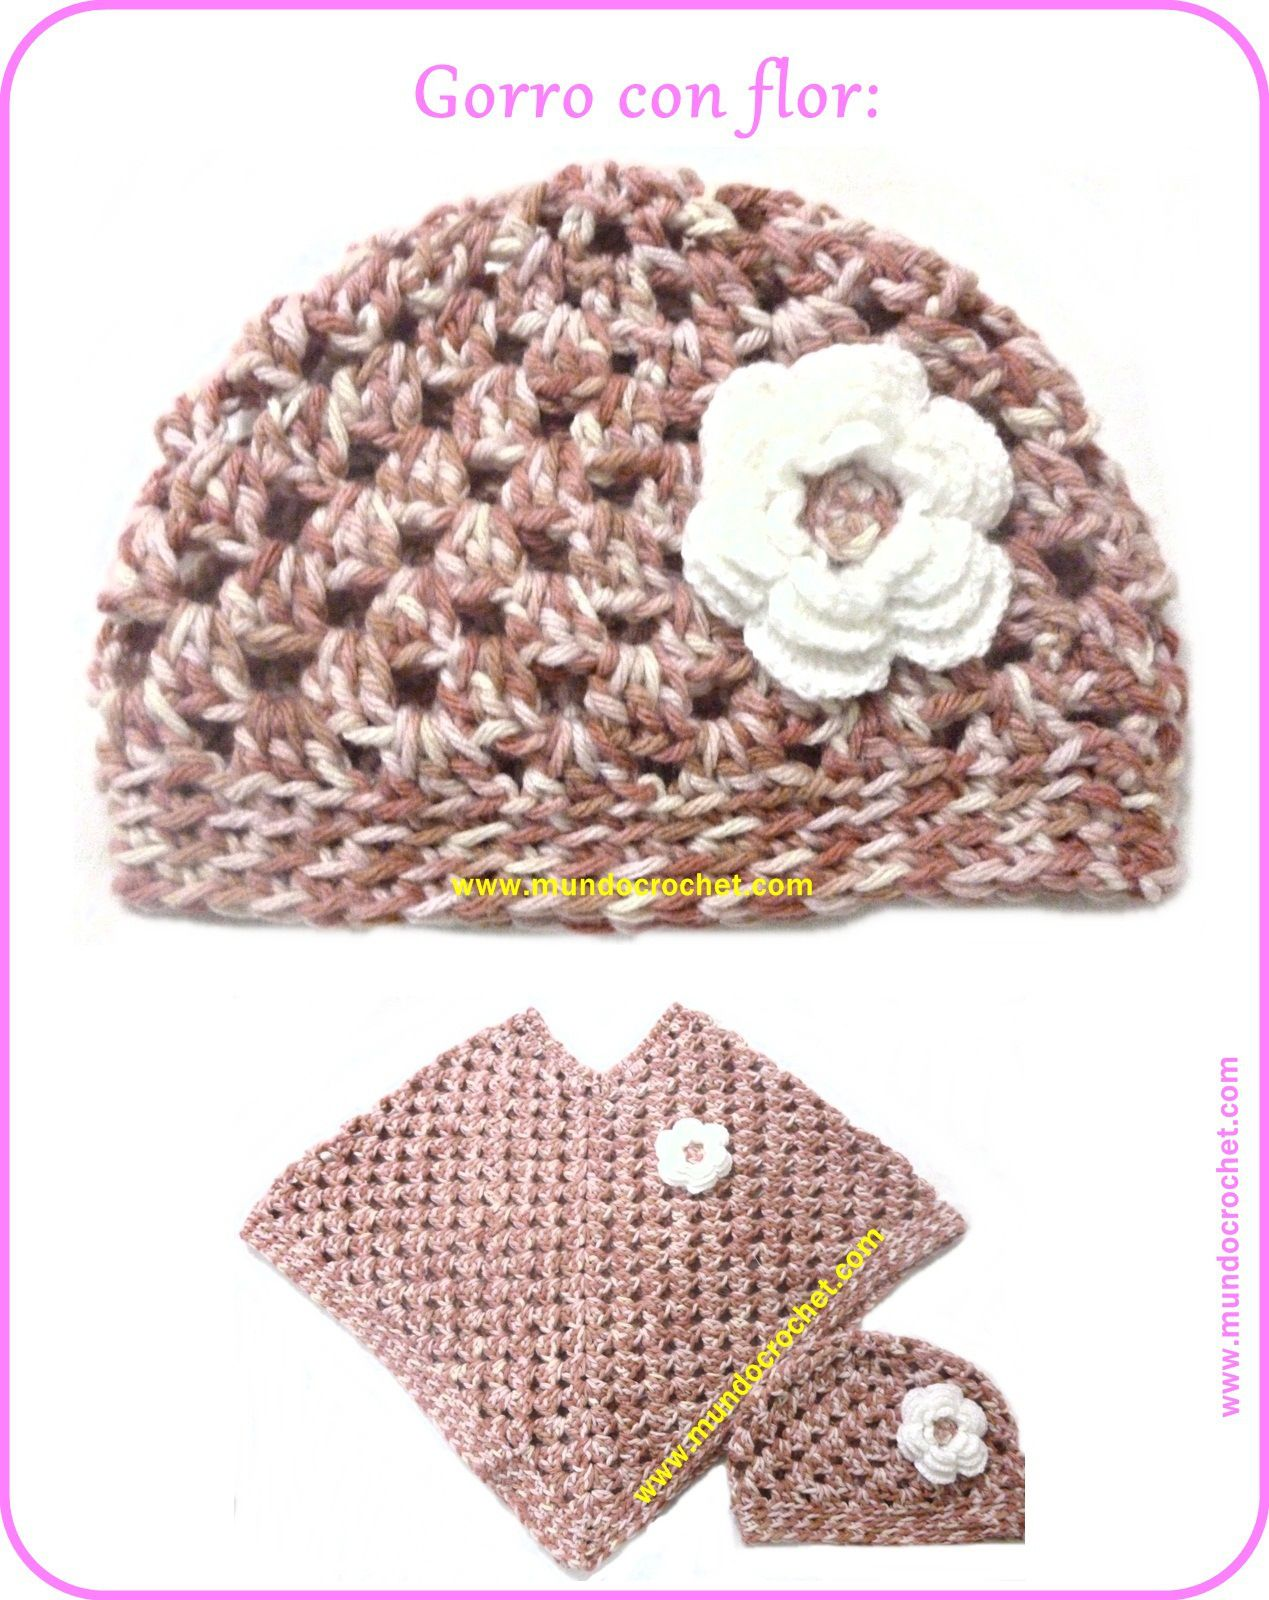 Gorro crochet | De todo Crochet | Pinterest | Flor, Ganchillo y De todo